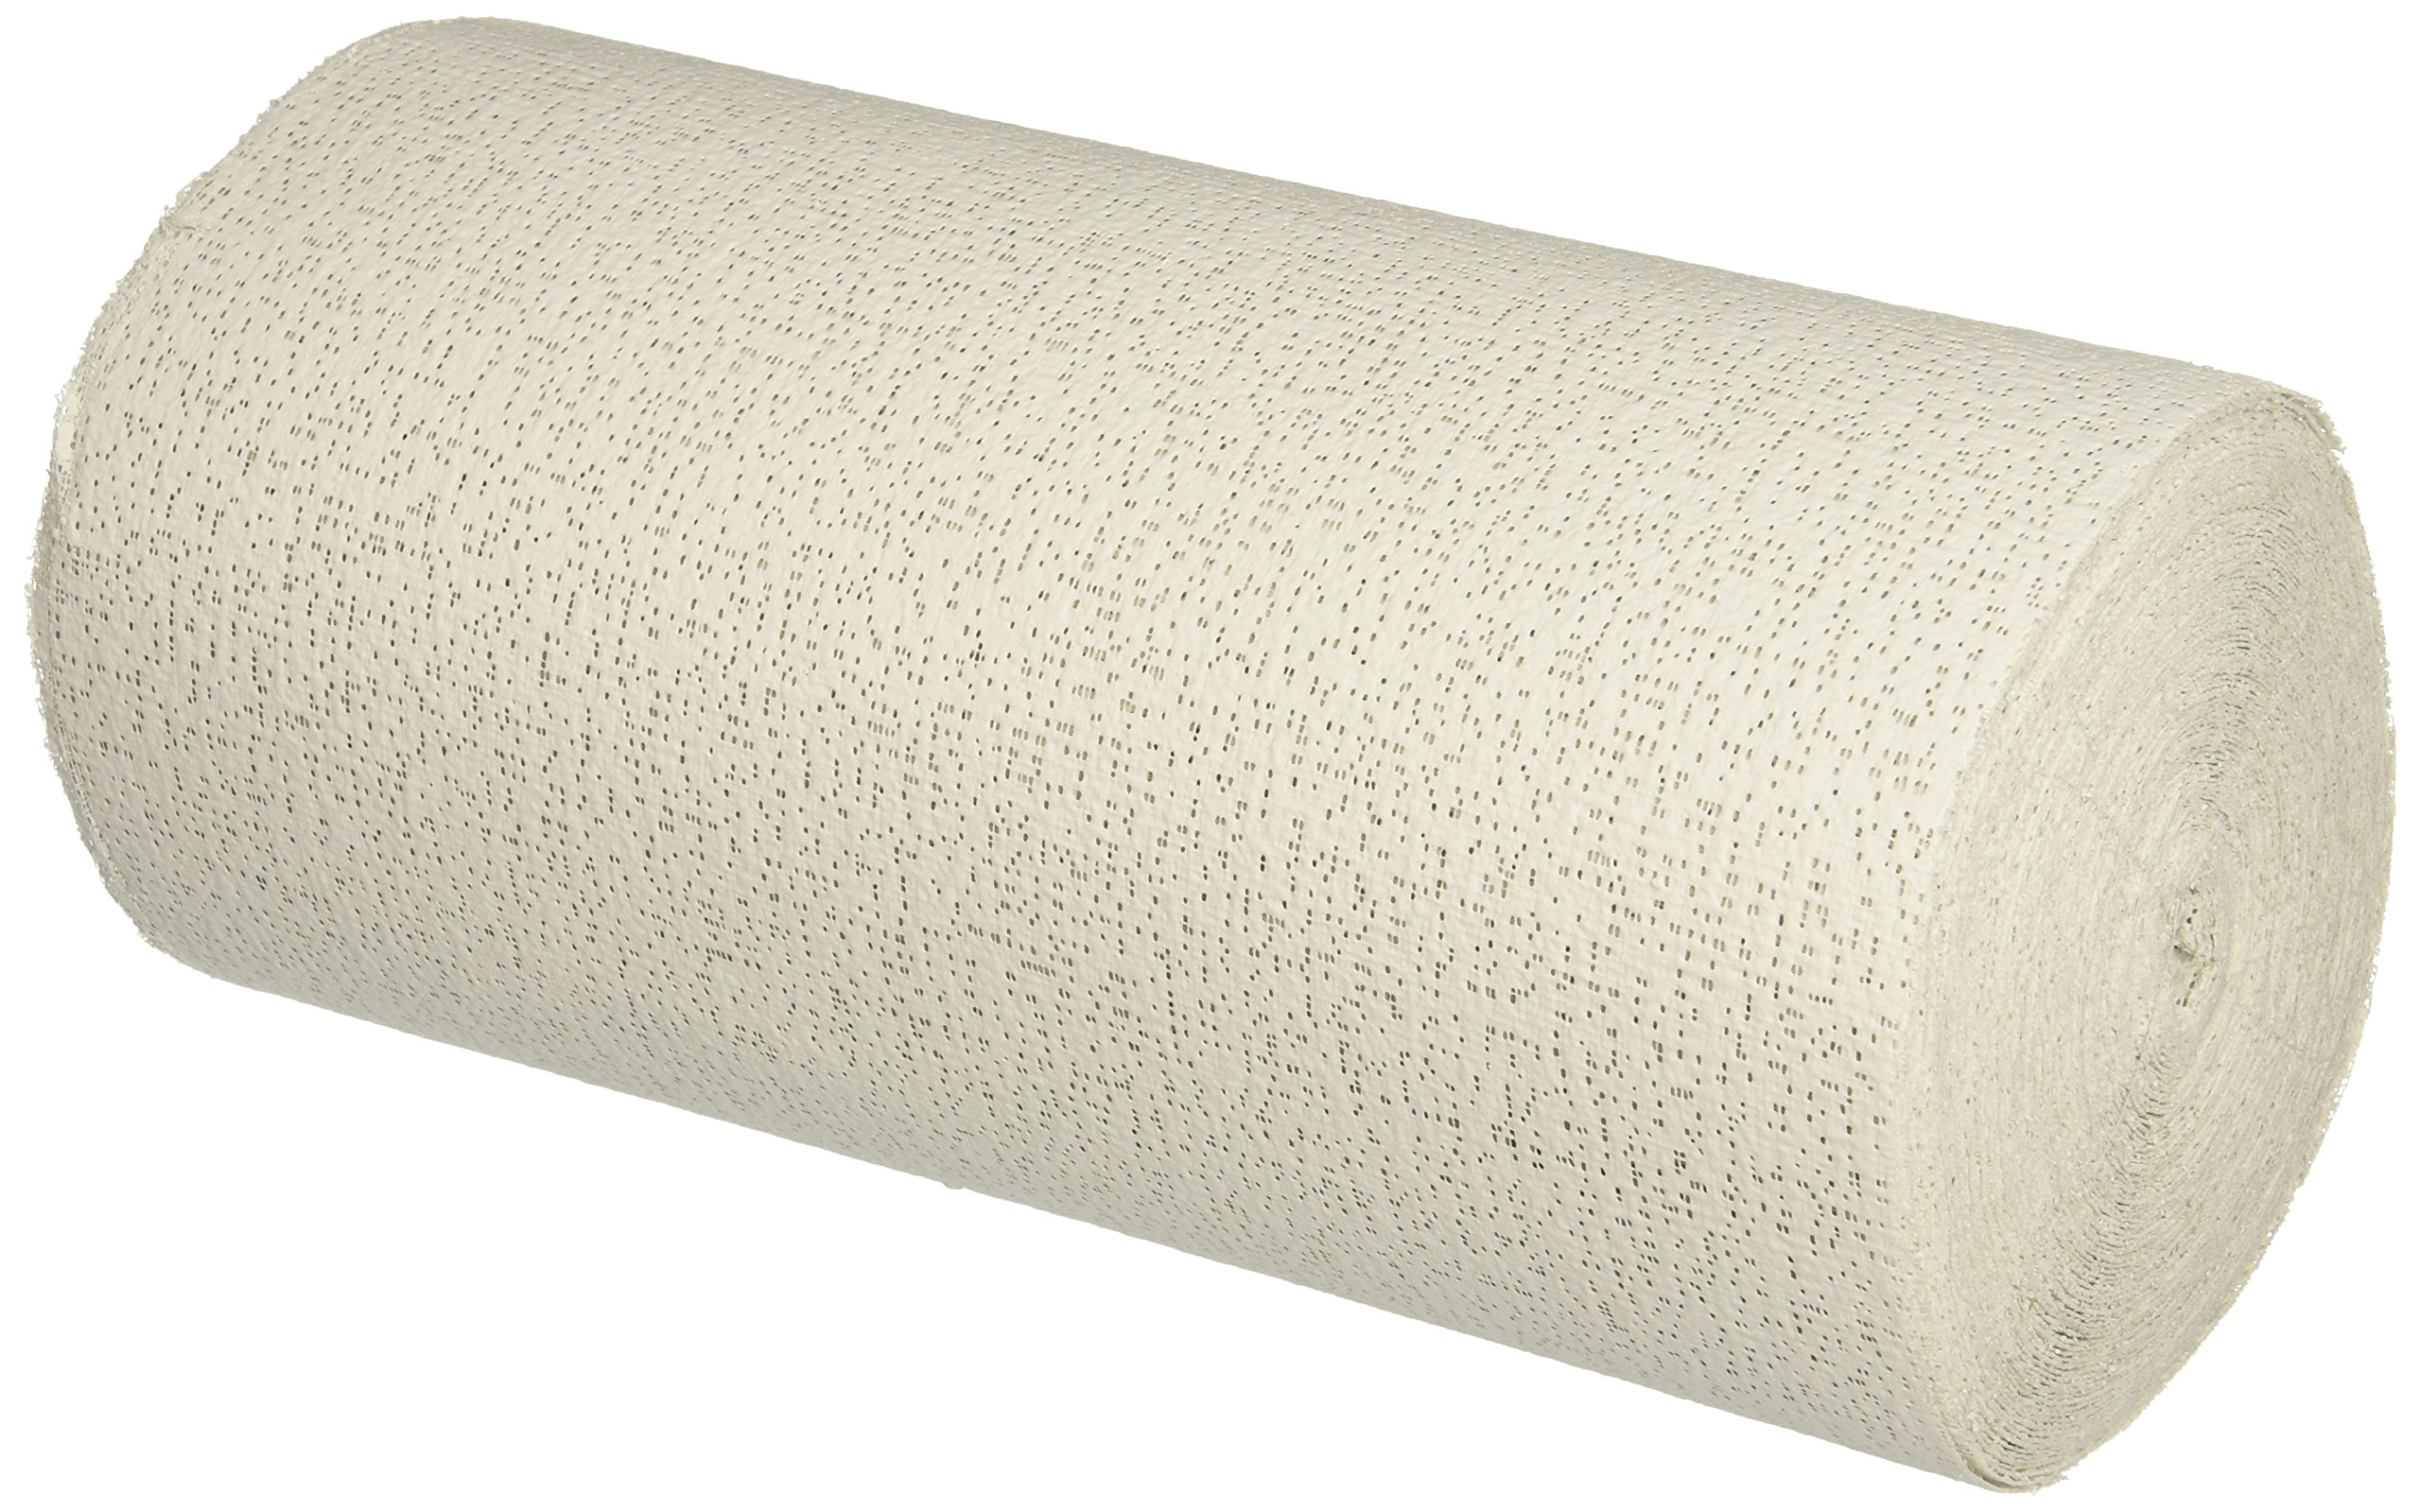 ACTIVA Rigid Wrap Plaster Cloth, 5 pounds product image